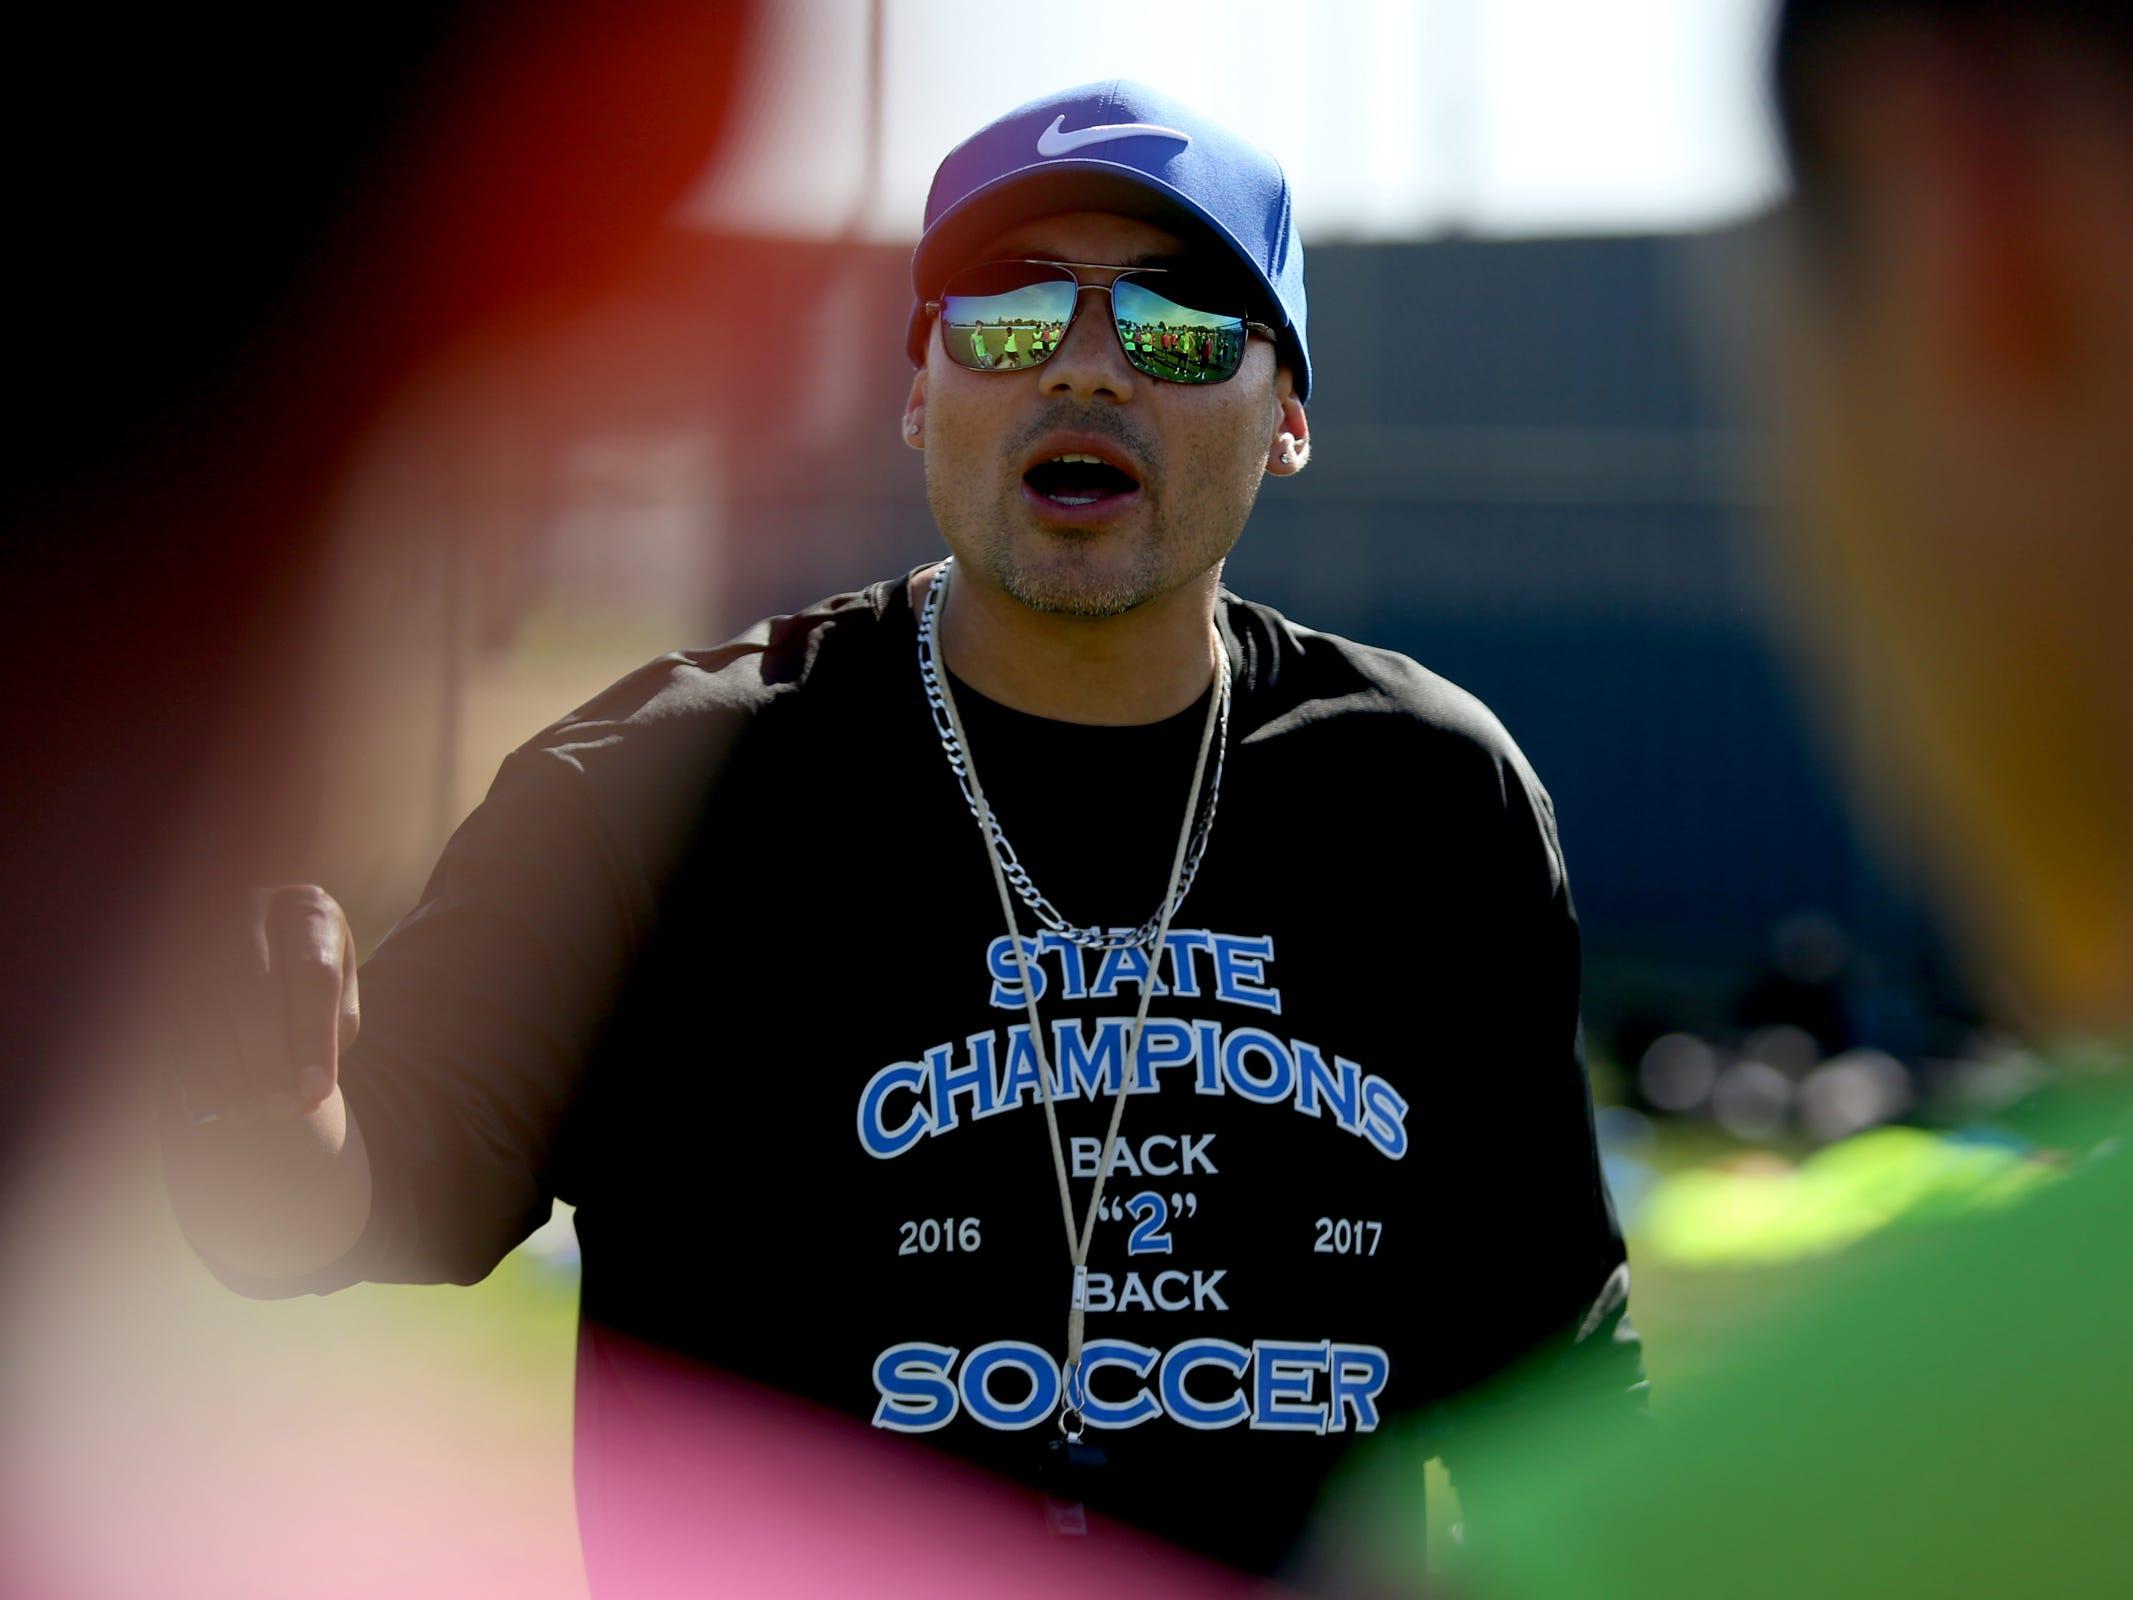 Boys soccer head coach Leroy Sanchez leads a practice at Woodburn High School on Wednesday, Aug. 29, 2018.